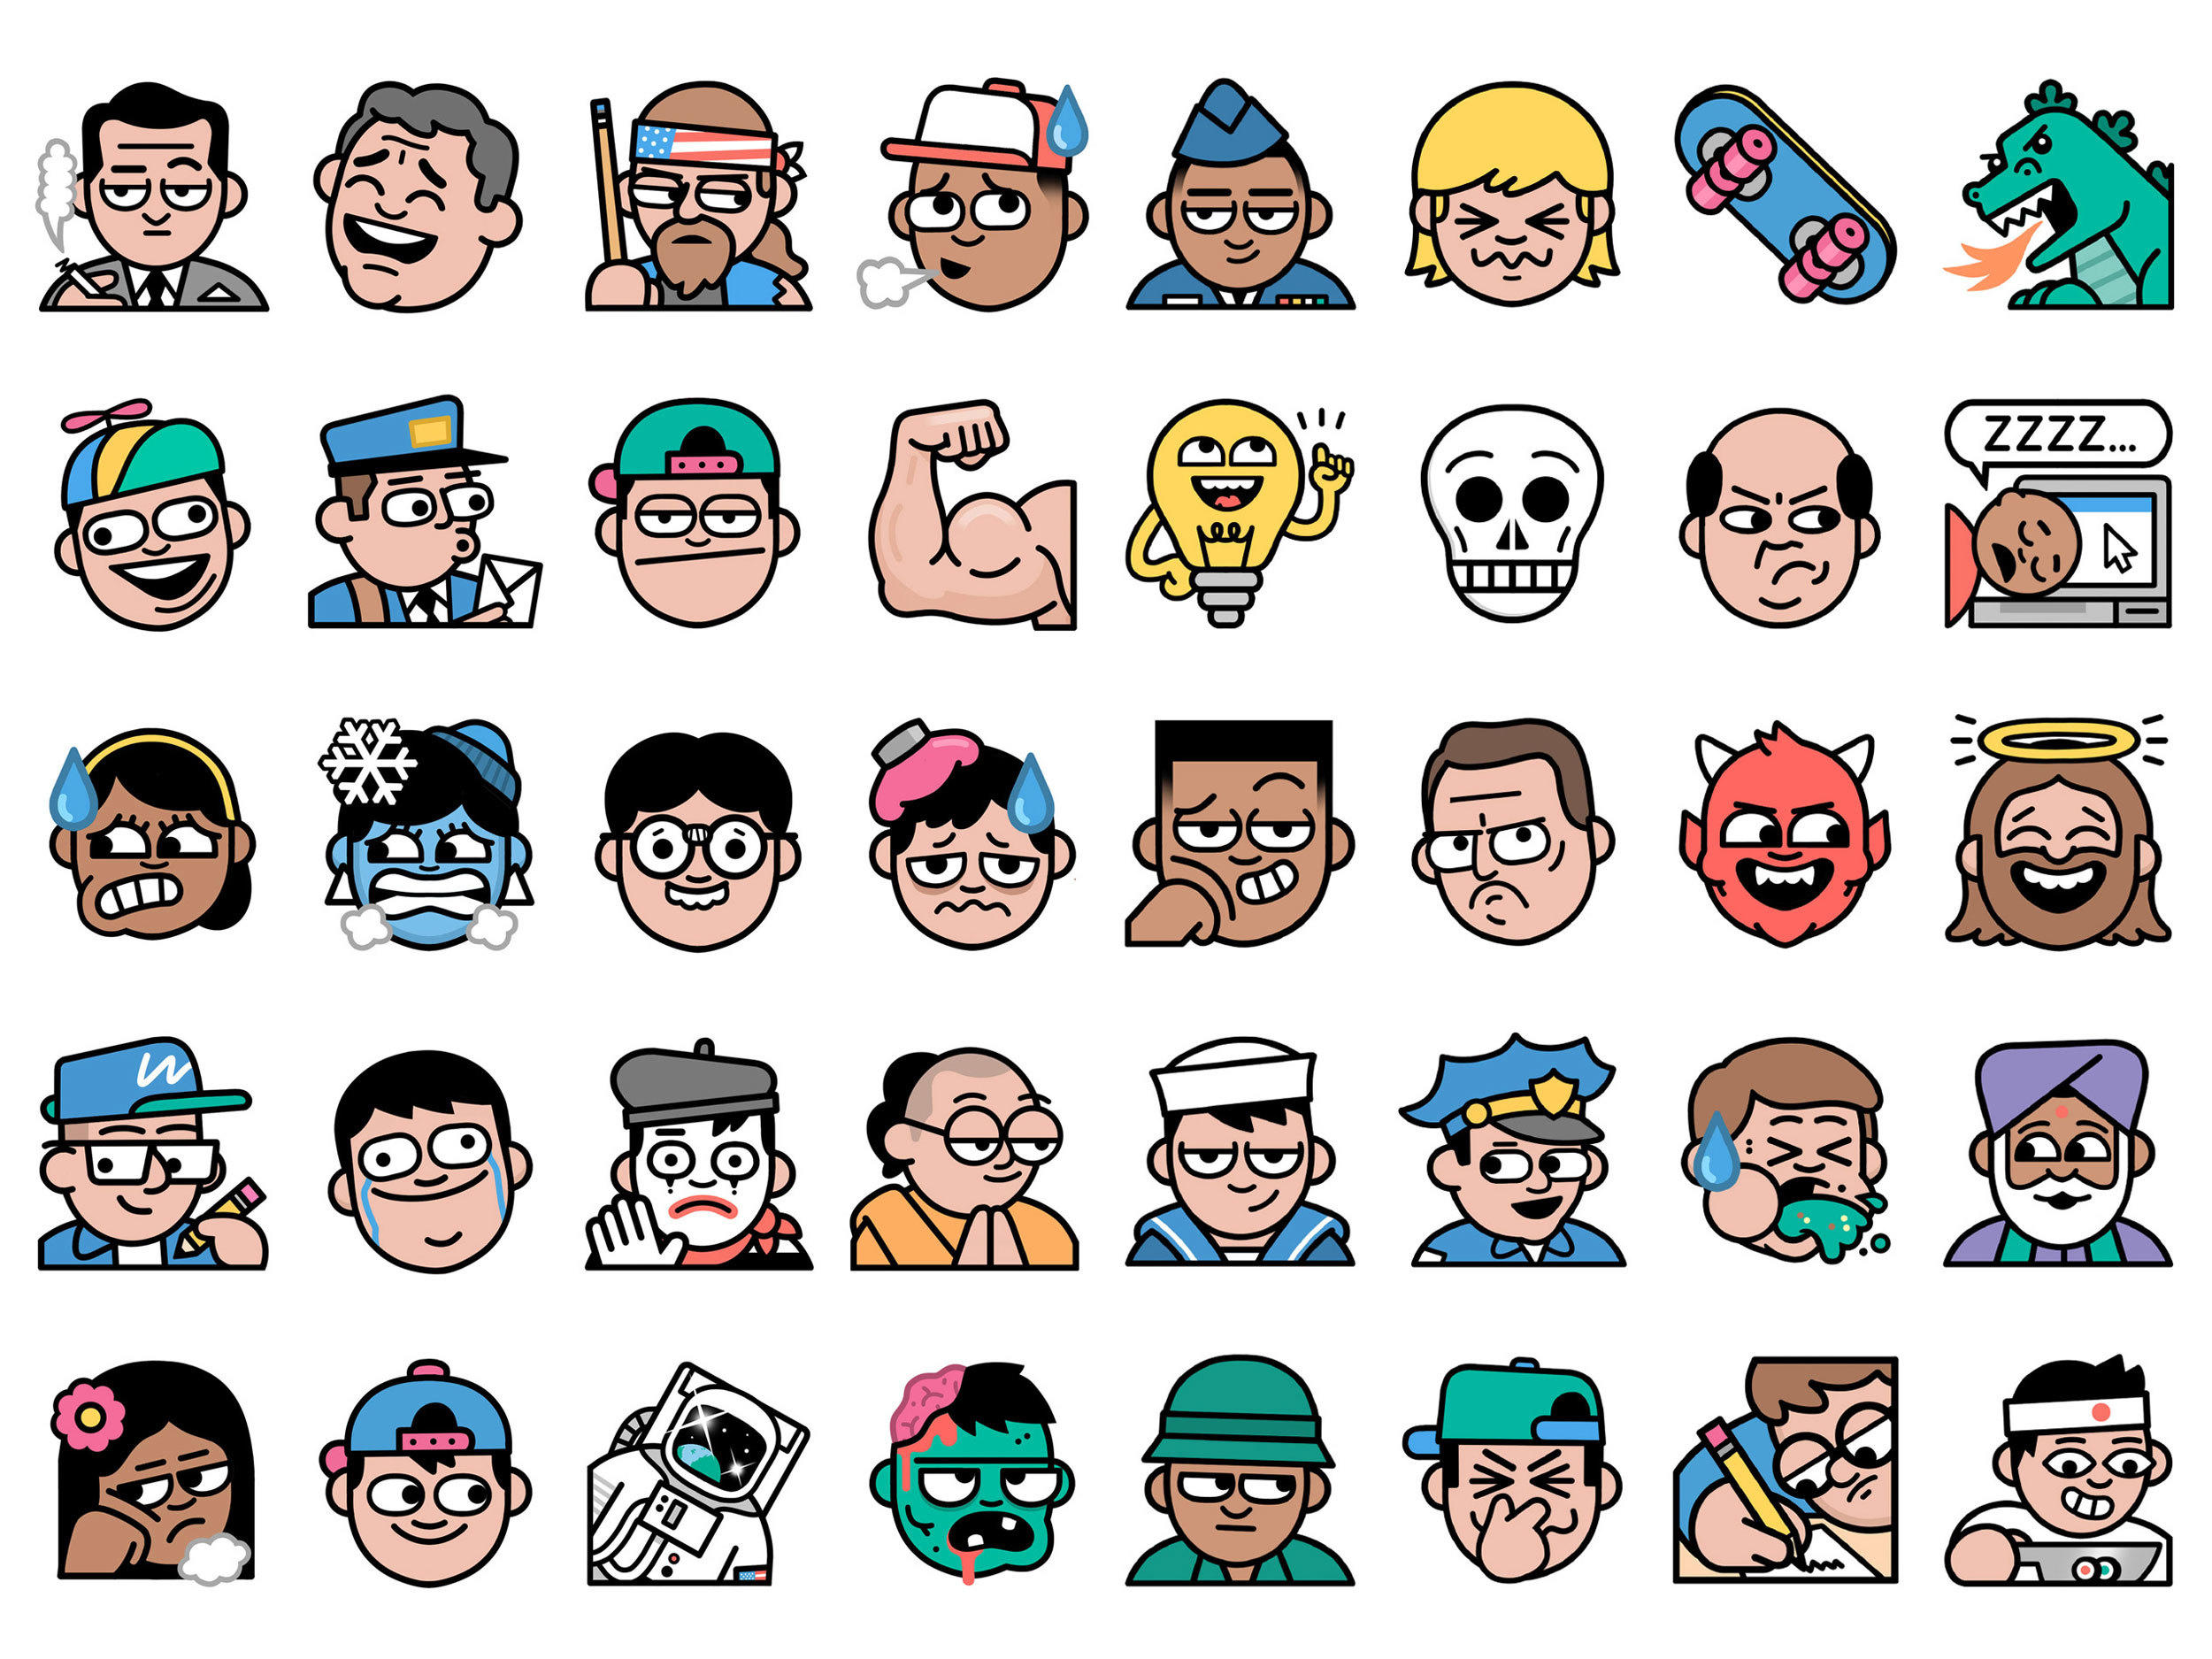 Line Drawing Emoji : Line emoji project — dan woodger illustration